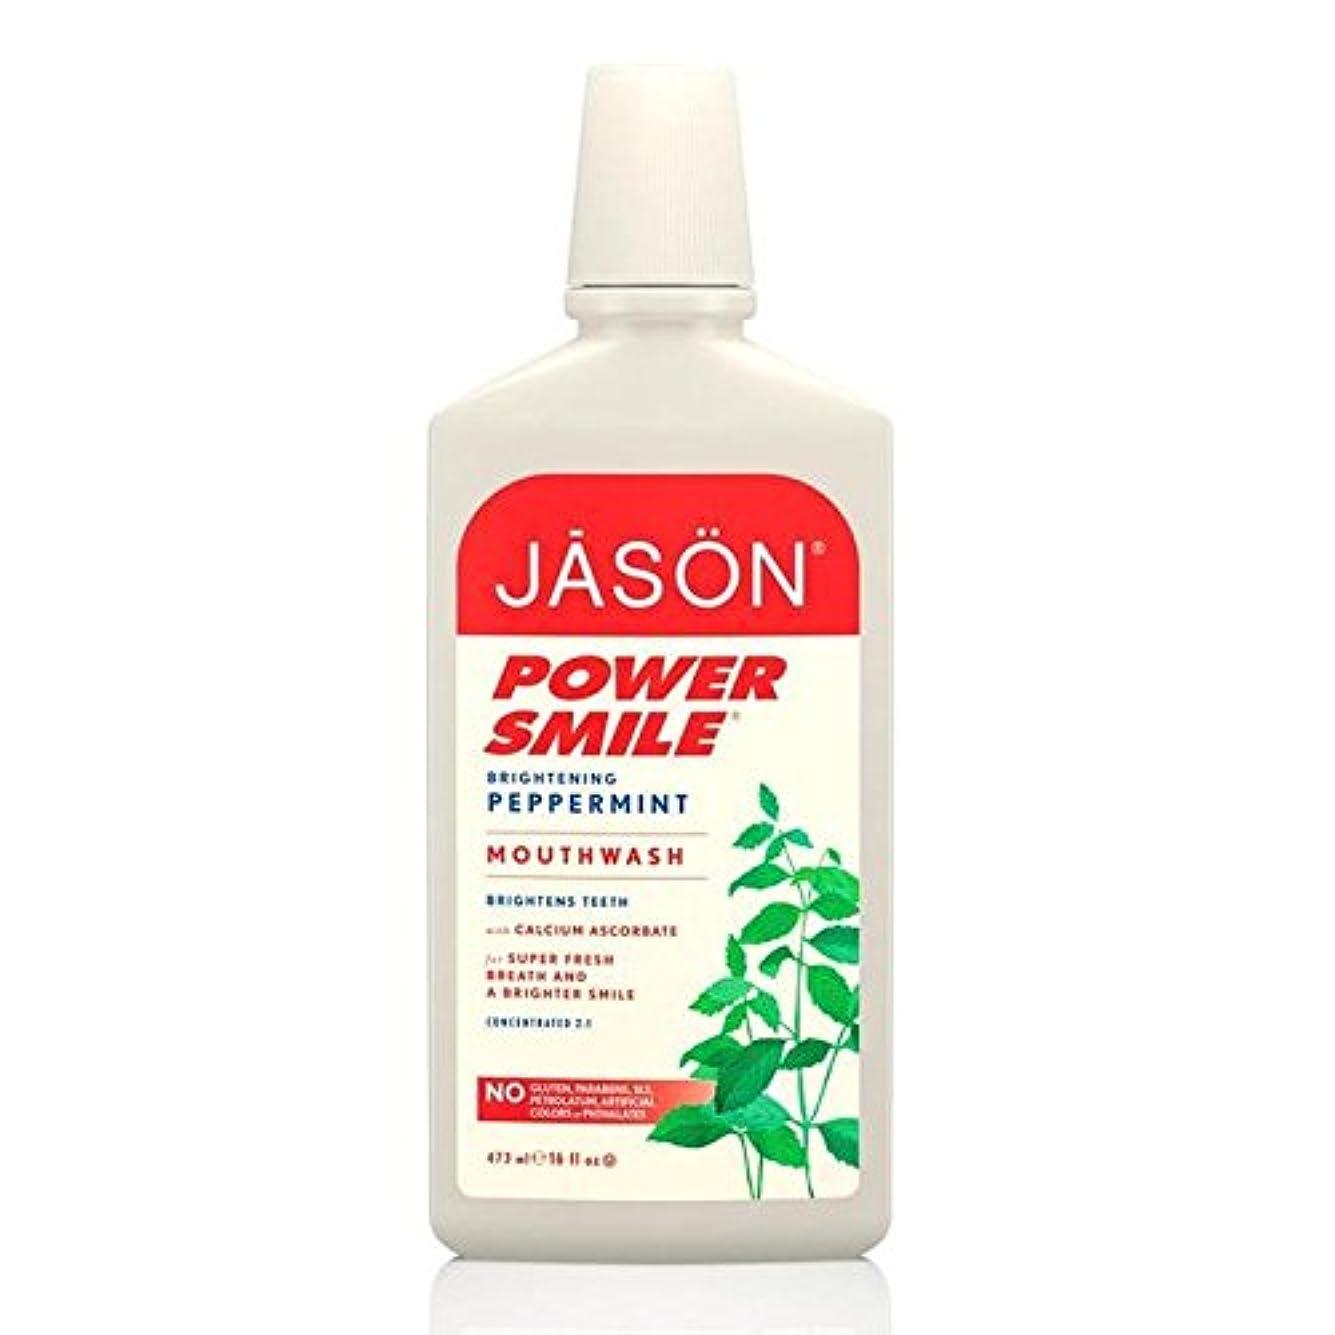 Jason Powersmile Mouthwash 480ml (Pack of 6) - ジェイソンマウスウォッシュ480ミリリットル x6 [並行輸入品]